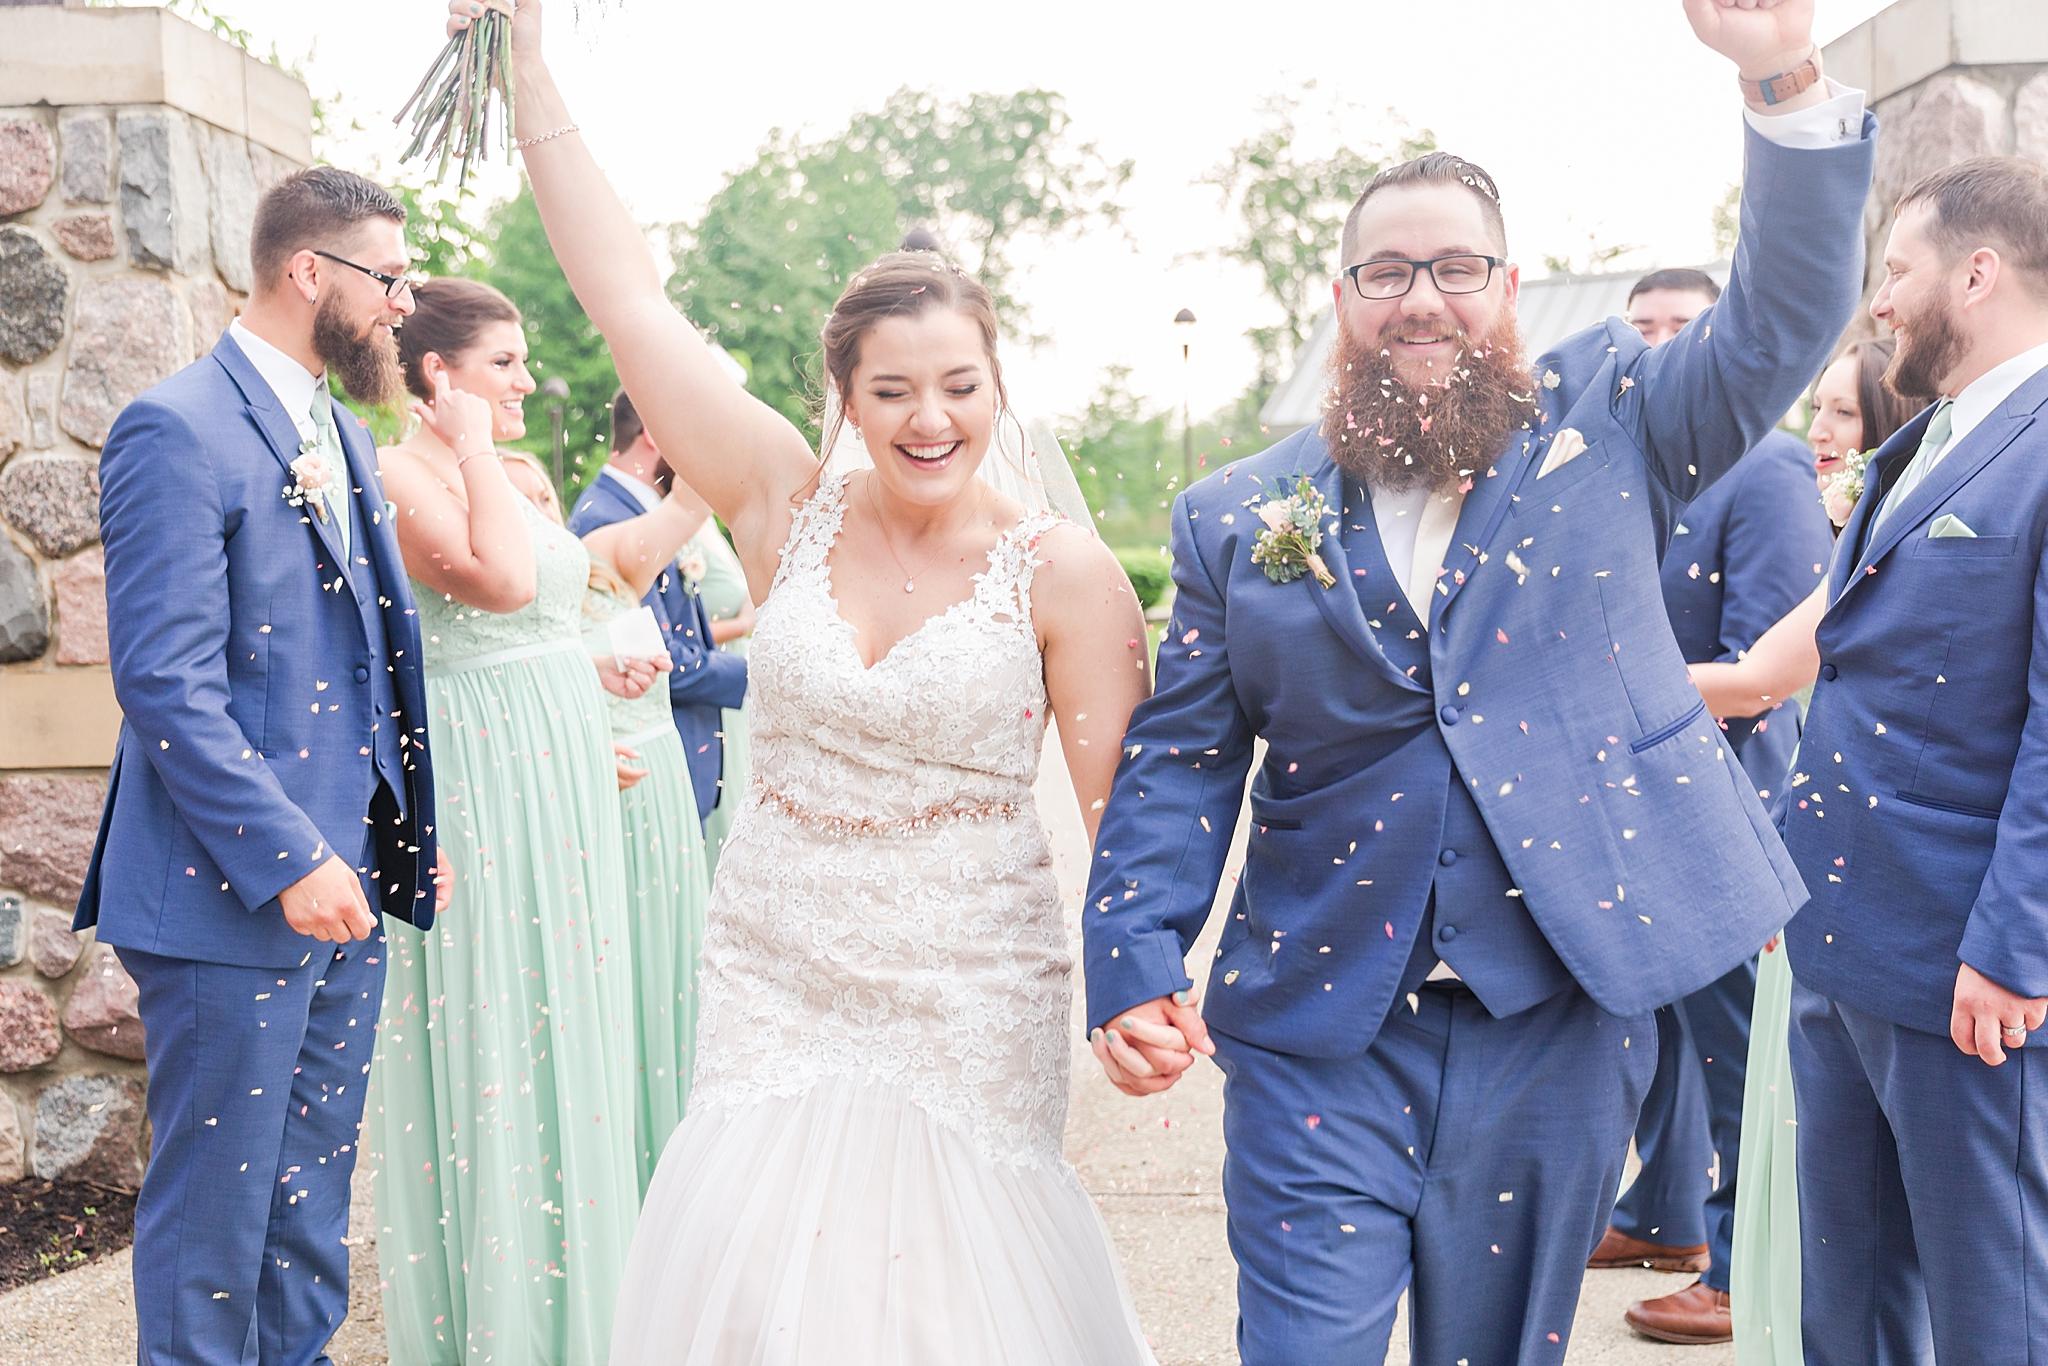 detroit-wedding-photographer-brownstown-event-center-wedding-photos-sam-josh-by-courtney-carolyn-photography_0071.jpg